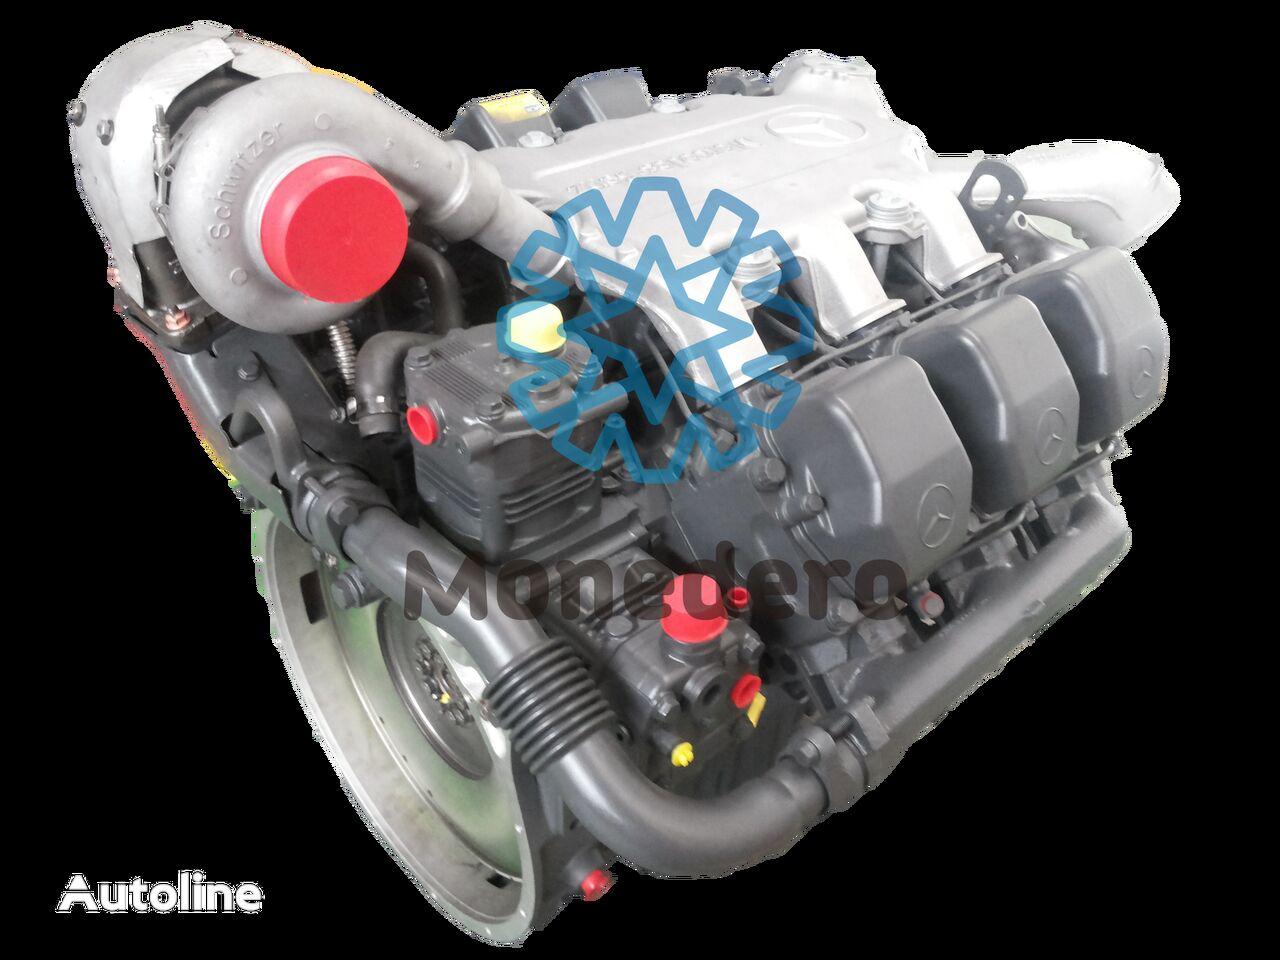 MERCEDES-BENZ OM 501 LA engine for truck